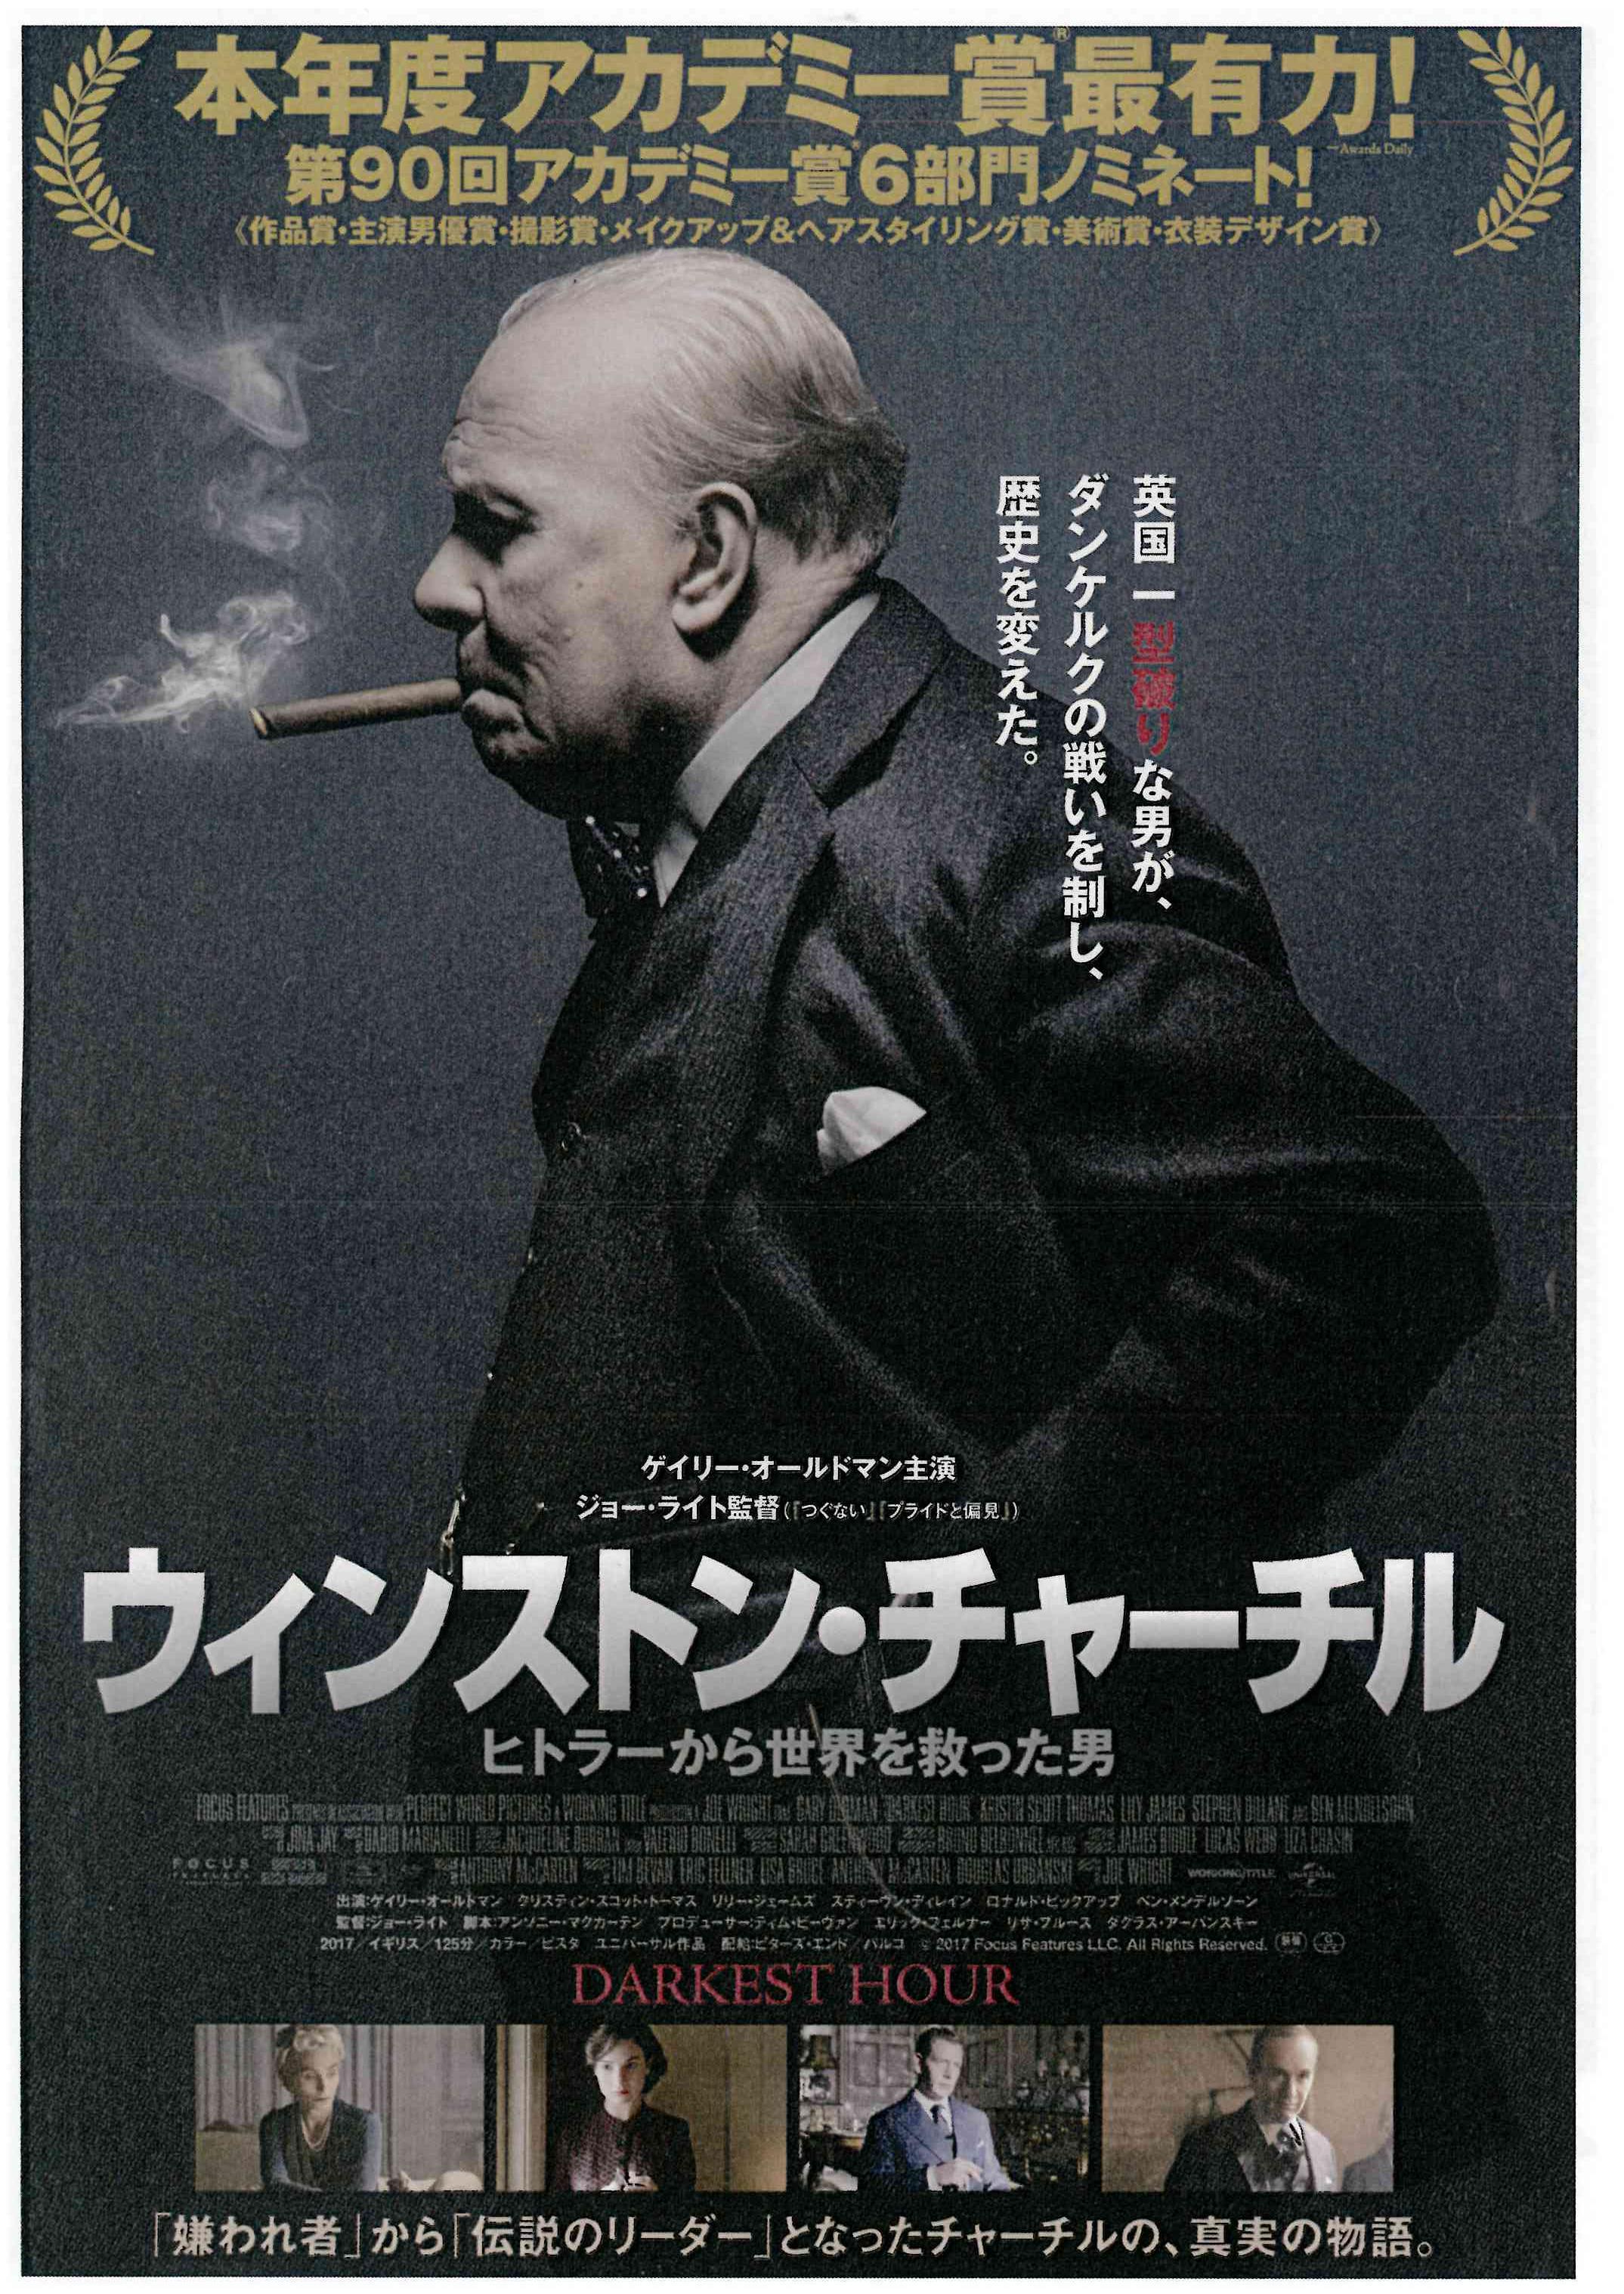 http://www.zushi-kaisei.ac.jp/news/ba8c1b46c0b08df417cfe9138cb4b0552738d69c.jpg